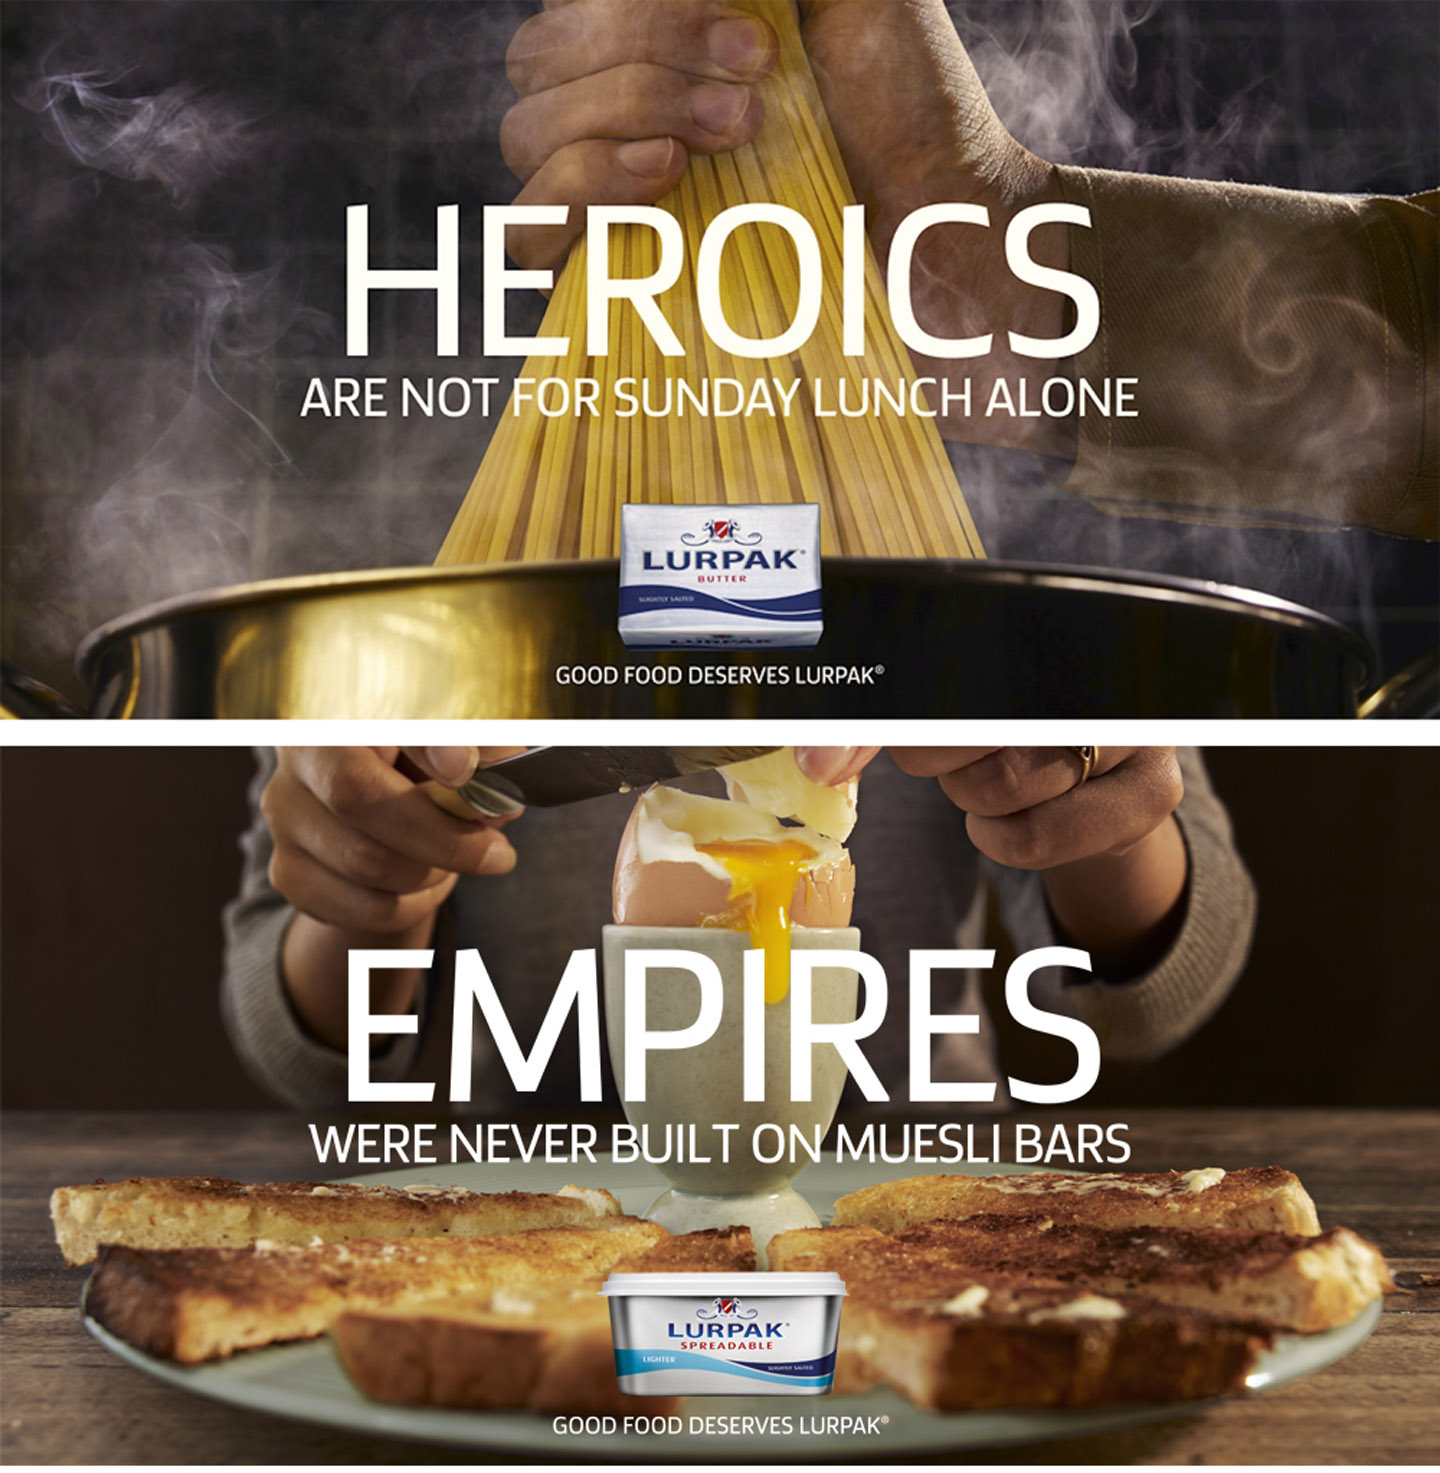 Nadege_Lurpak_Heroics